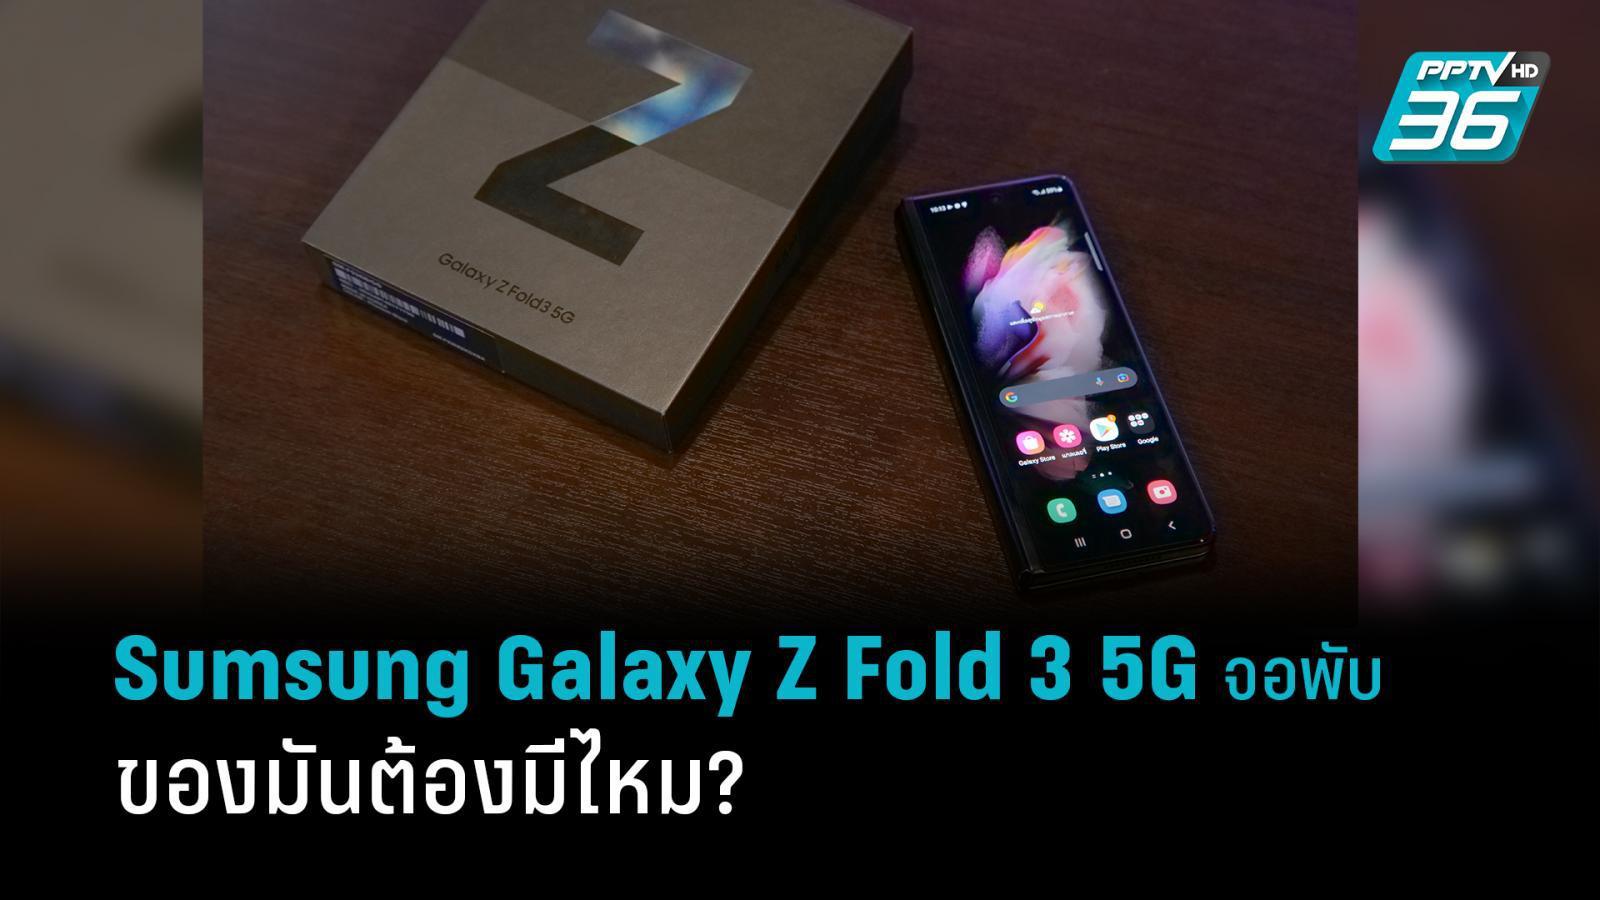 Sumsung Galaxy Z Fold 3 5G ว้าวไหม น่าซื้อแค่ไหน??